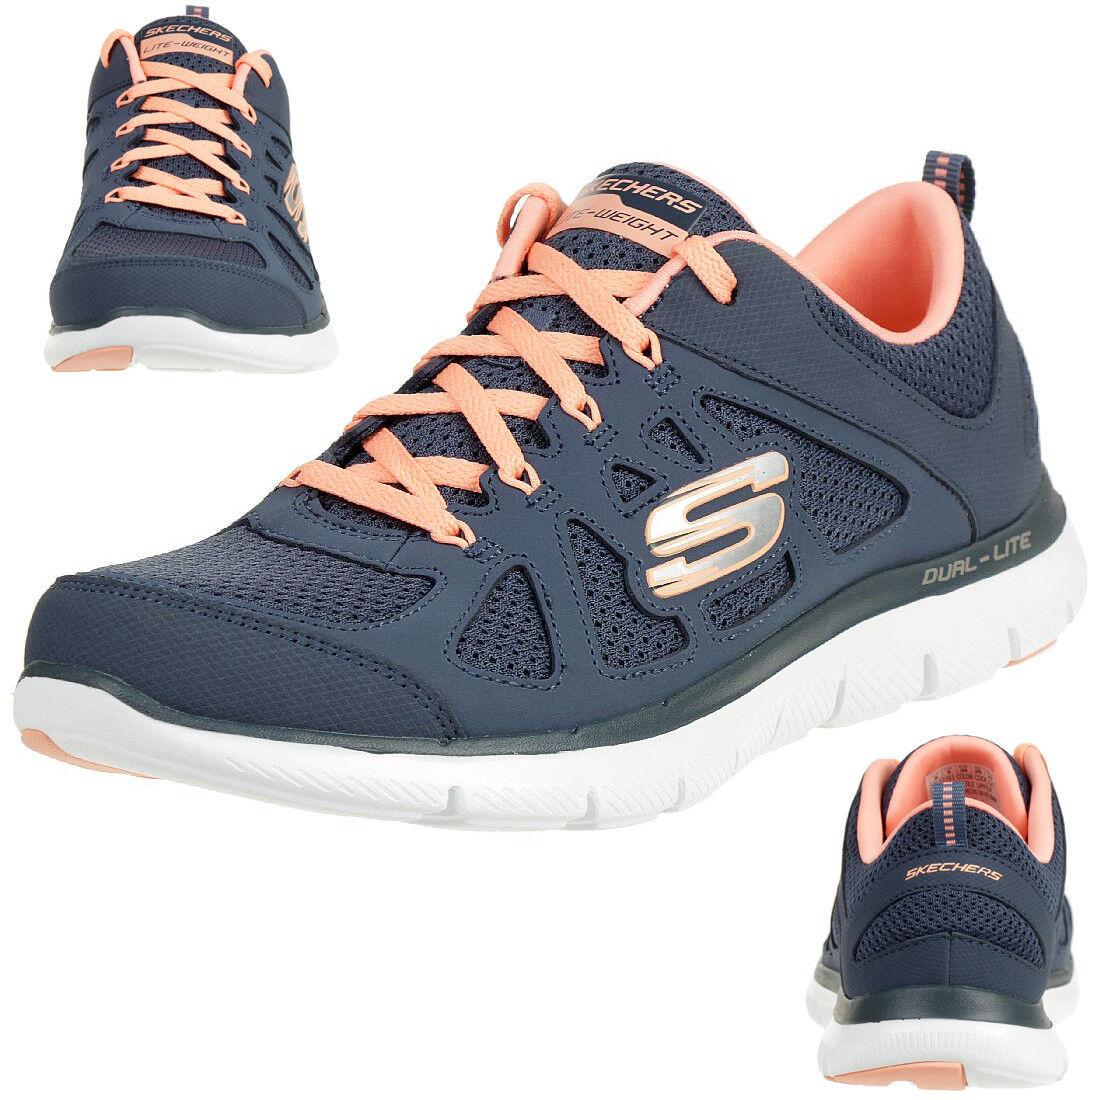 Skechers Flex appeal weight 2.0 simplista señora fitness zapatos Lite weight appeal SLT dbd2ff